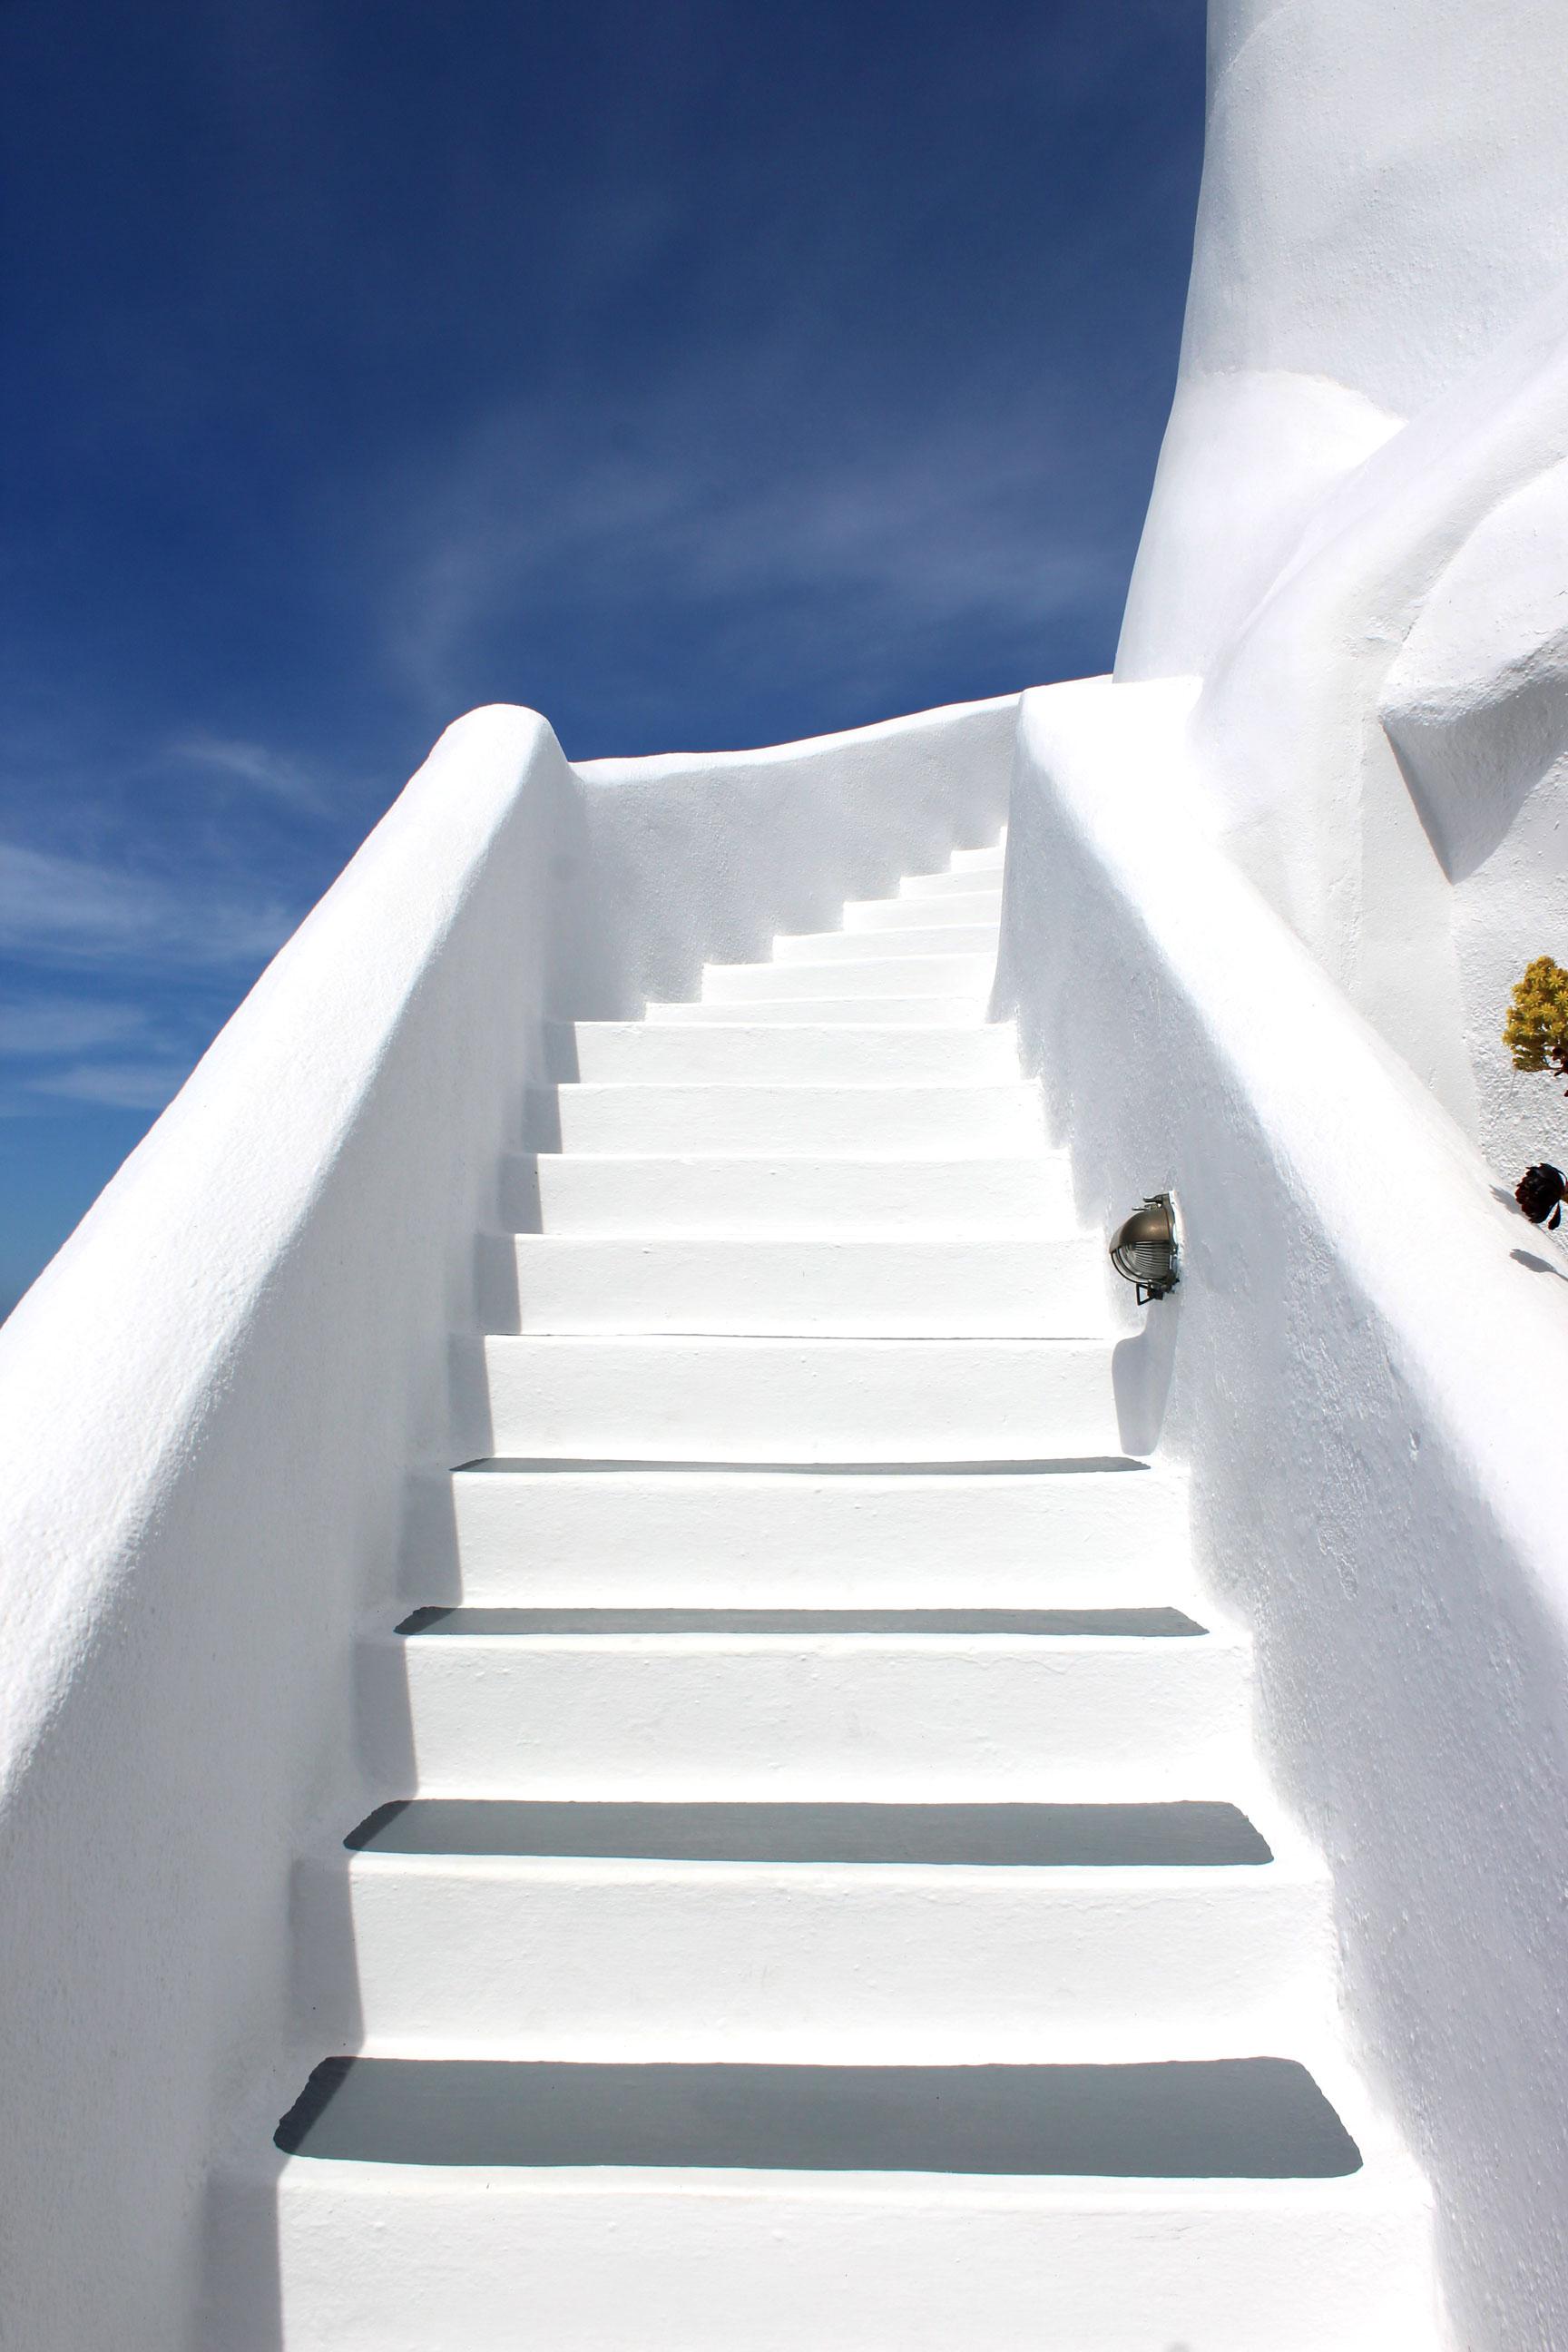 Blue skies and white walls at Ikies Hotel in Santorini.